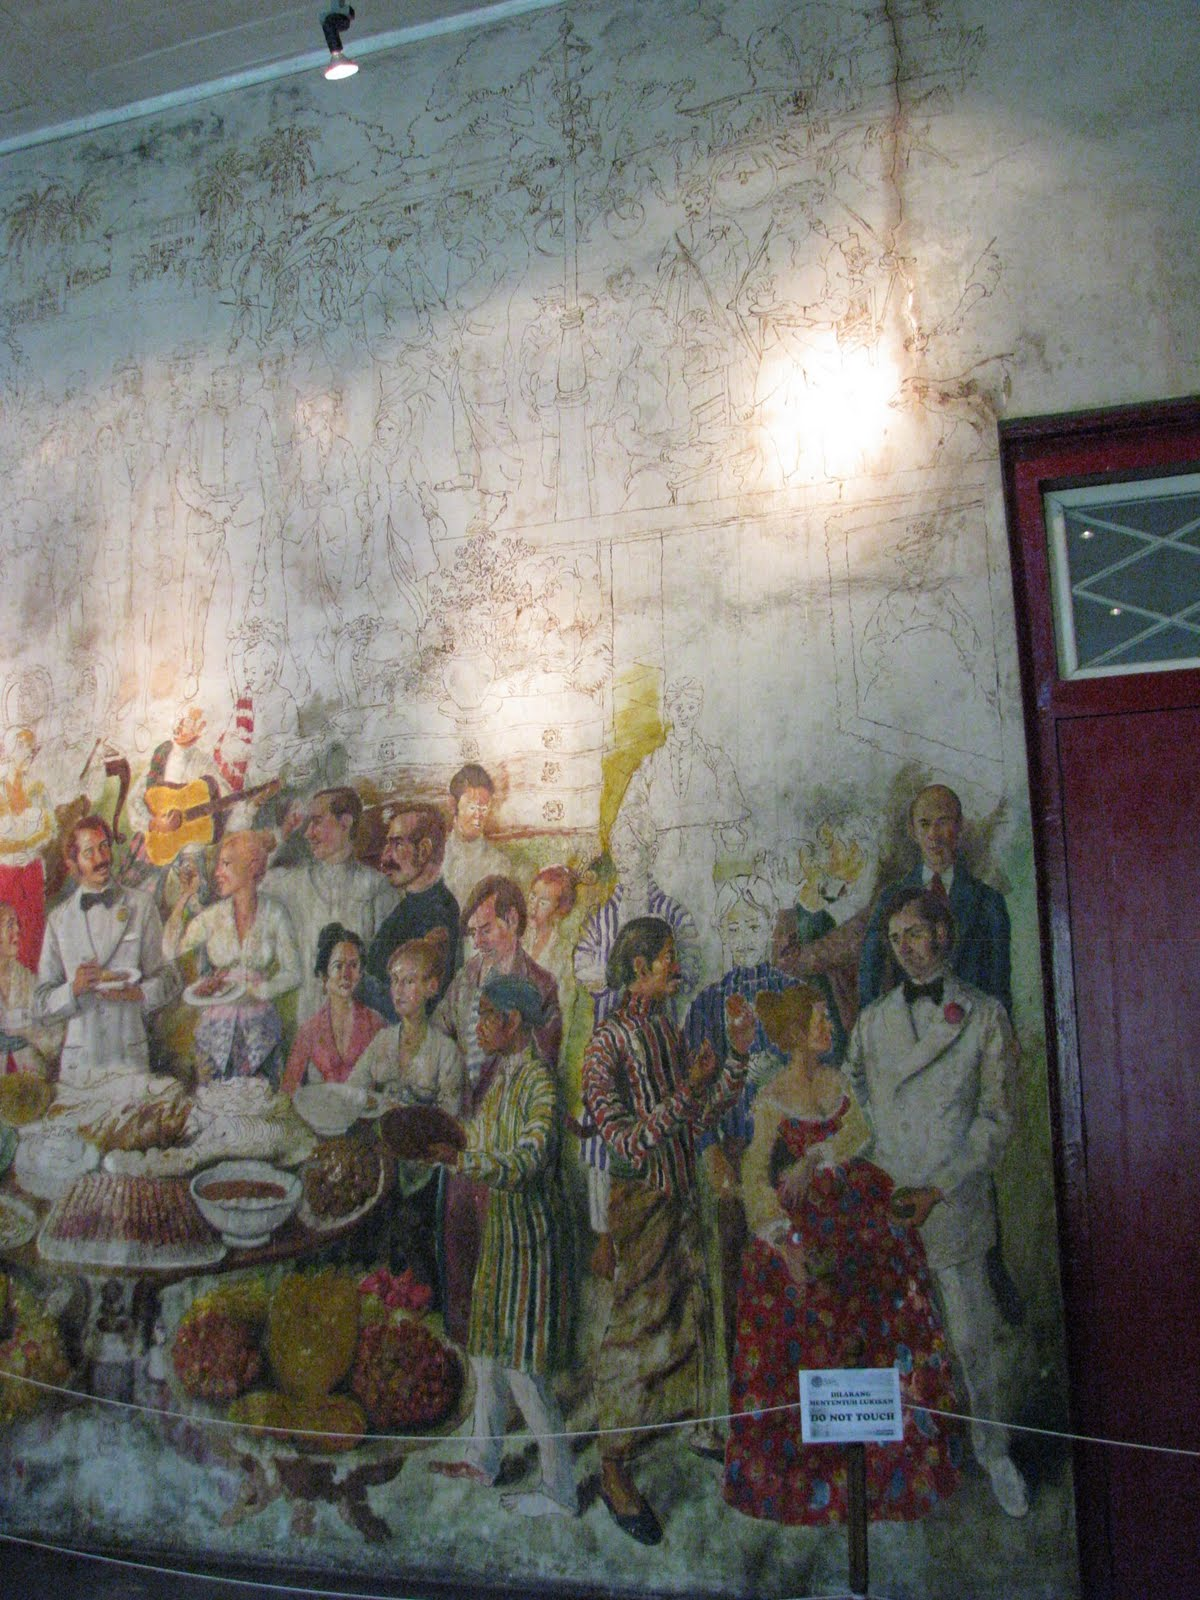 Mystery of batavia mural cantik oinkdenguik for Mural yang cantik